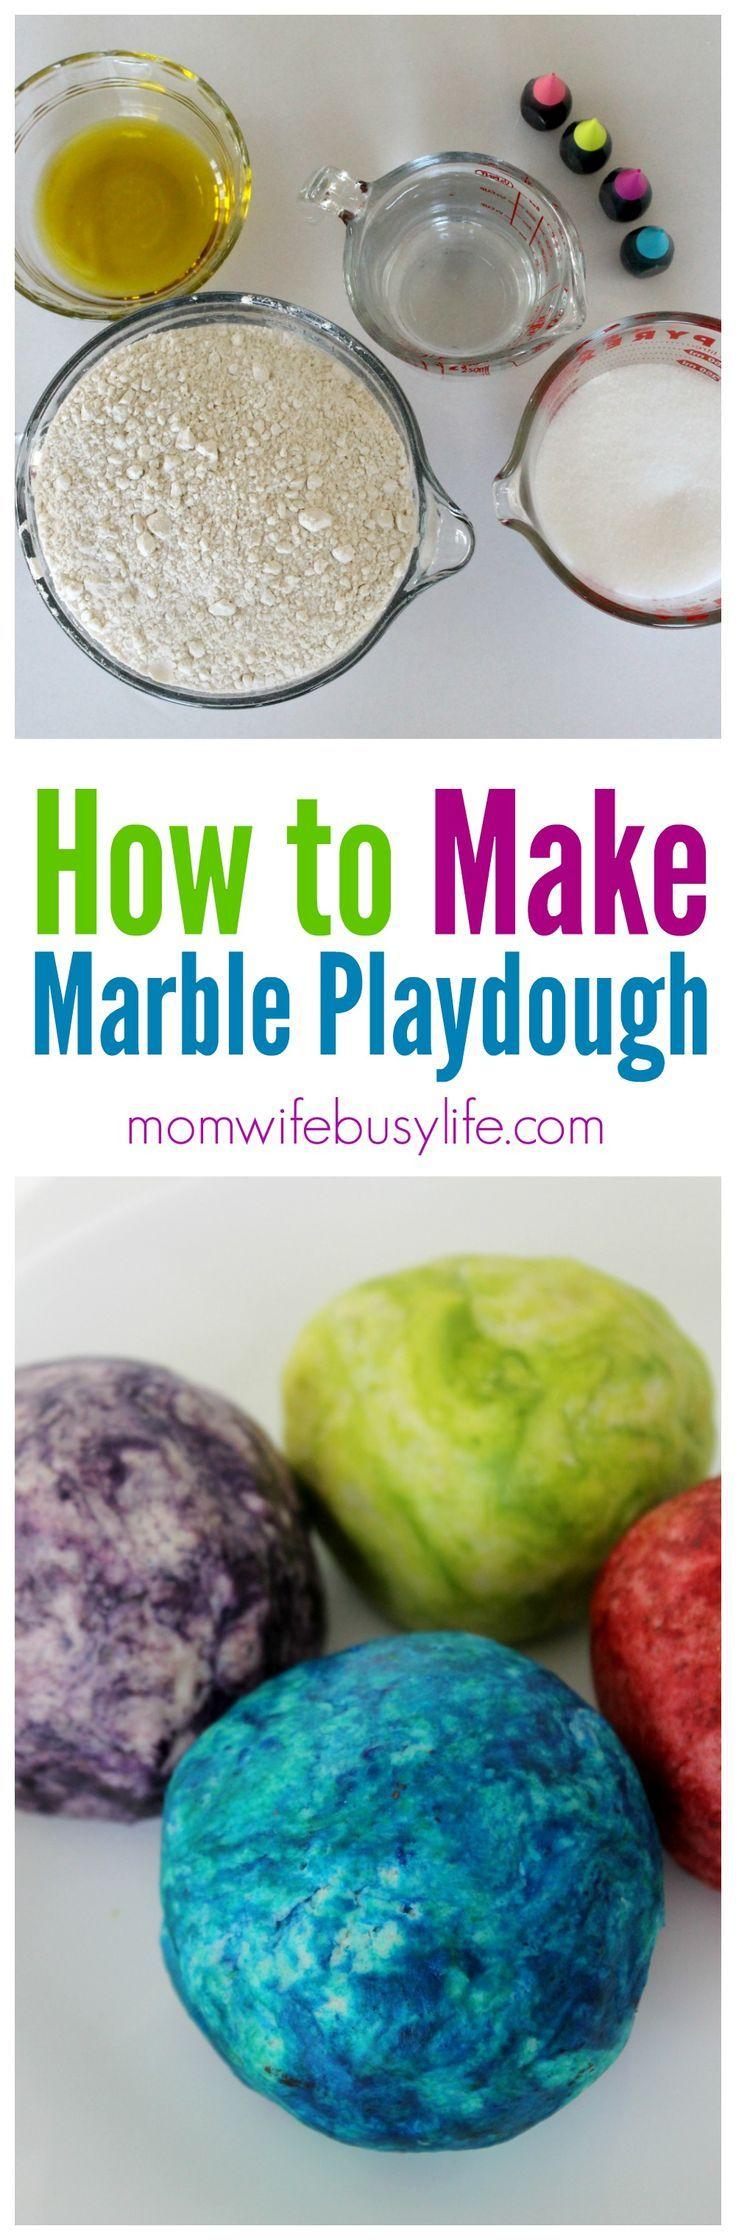 Marble Playdough Activity for Kids | DIY Playdough with Flour and ...